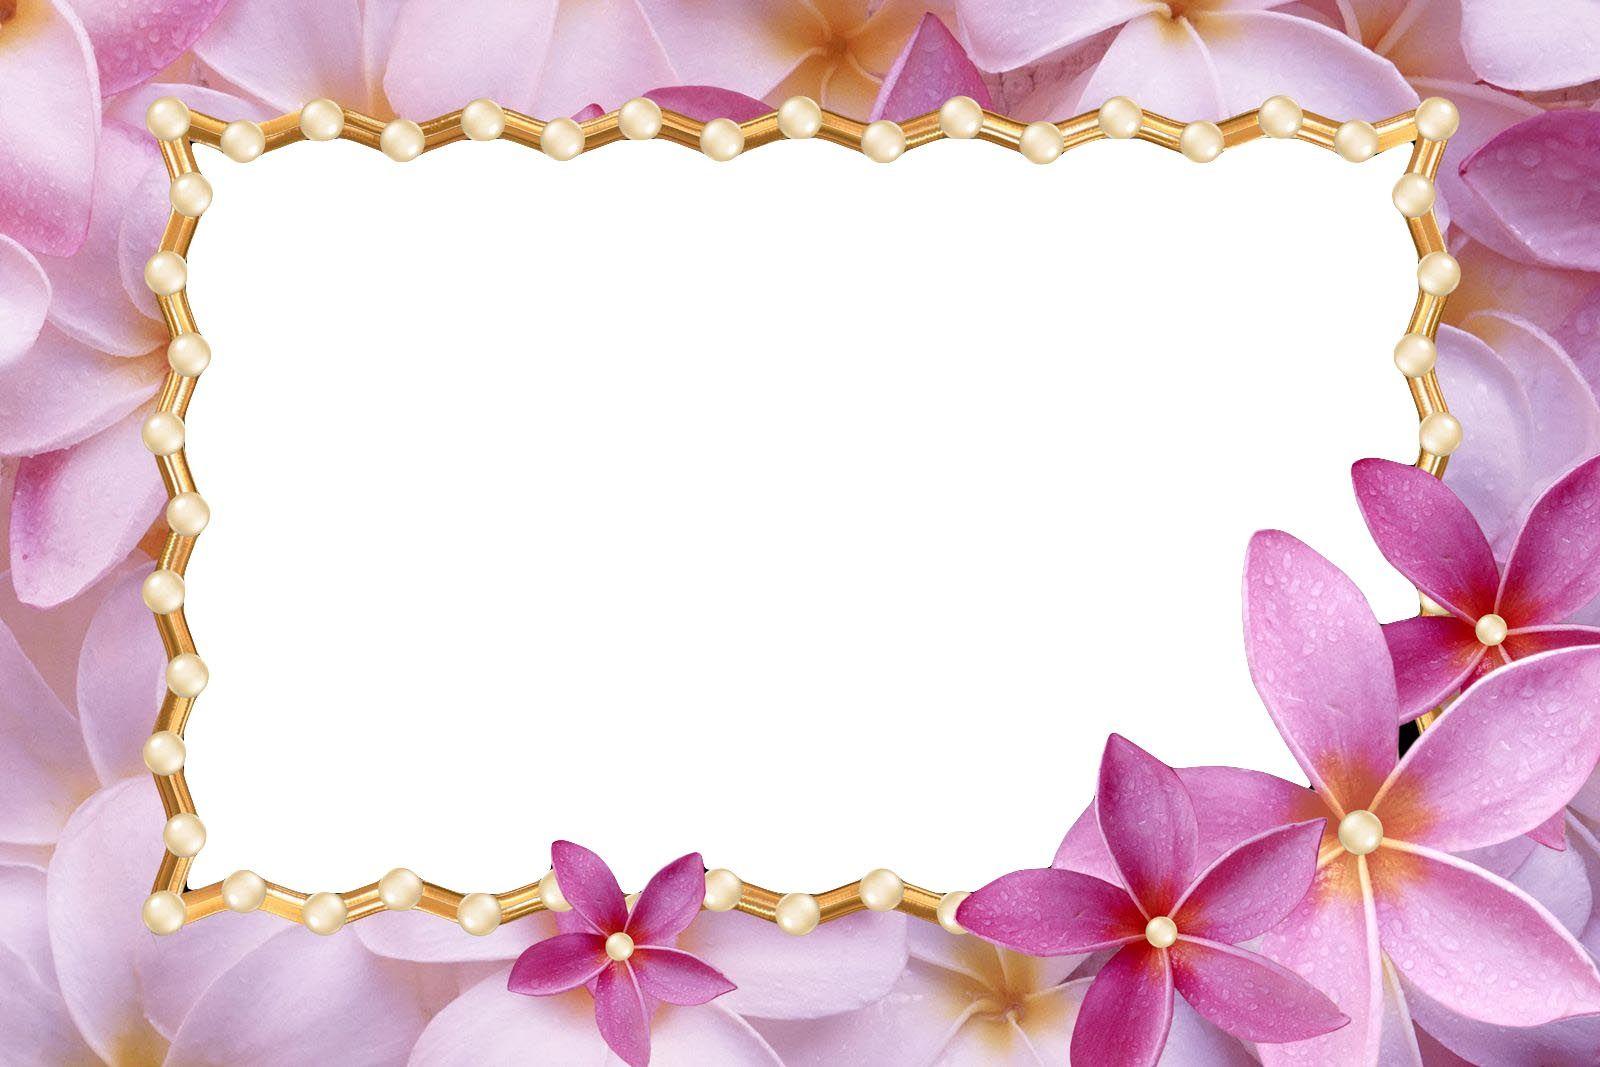 Love Frame Collection 10 1 Jpg 1600 1067 Flower Frame Love Frames Free Photo Frames